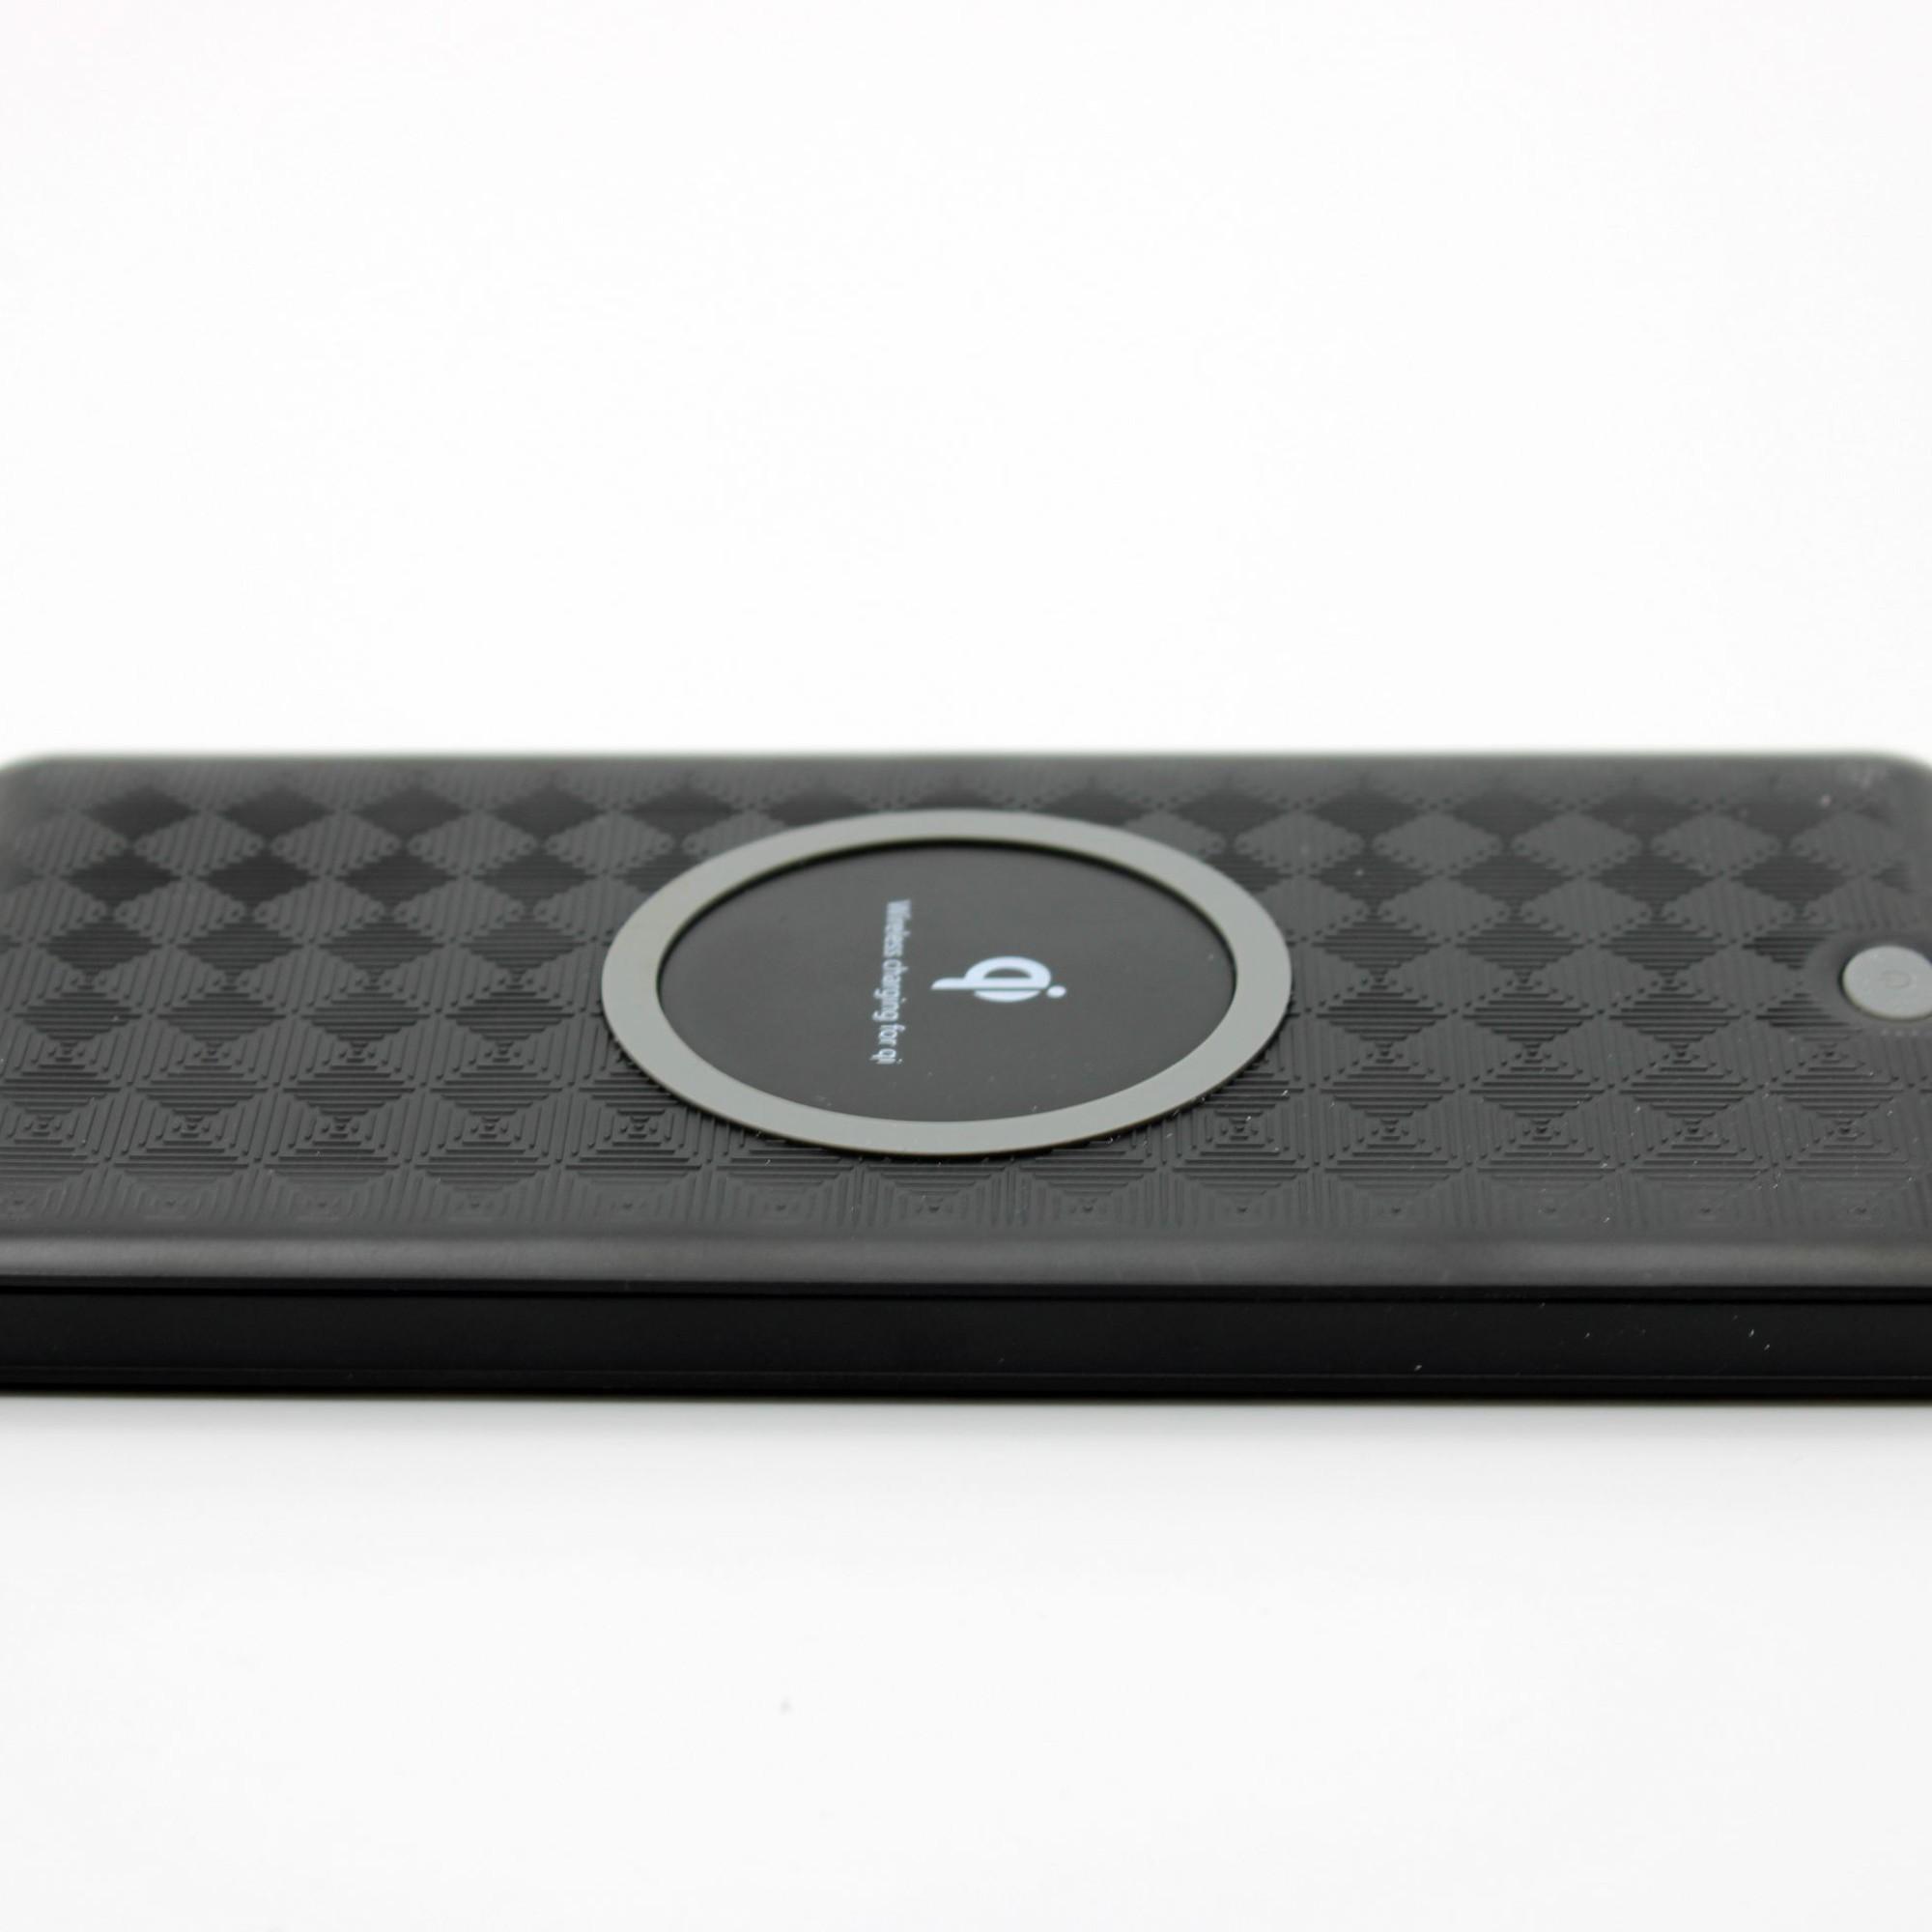 Bateria Extra Power Bank Qi Wireless 10000mah Indução